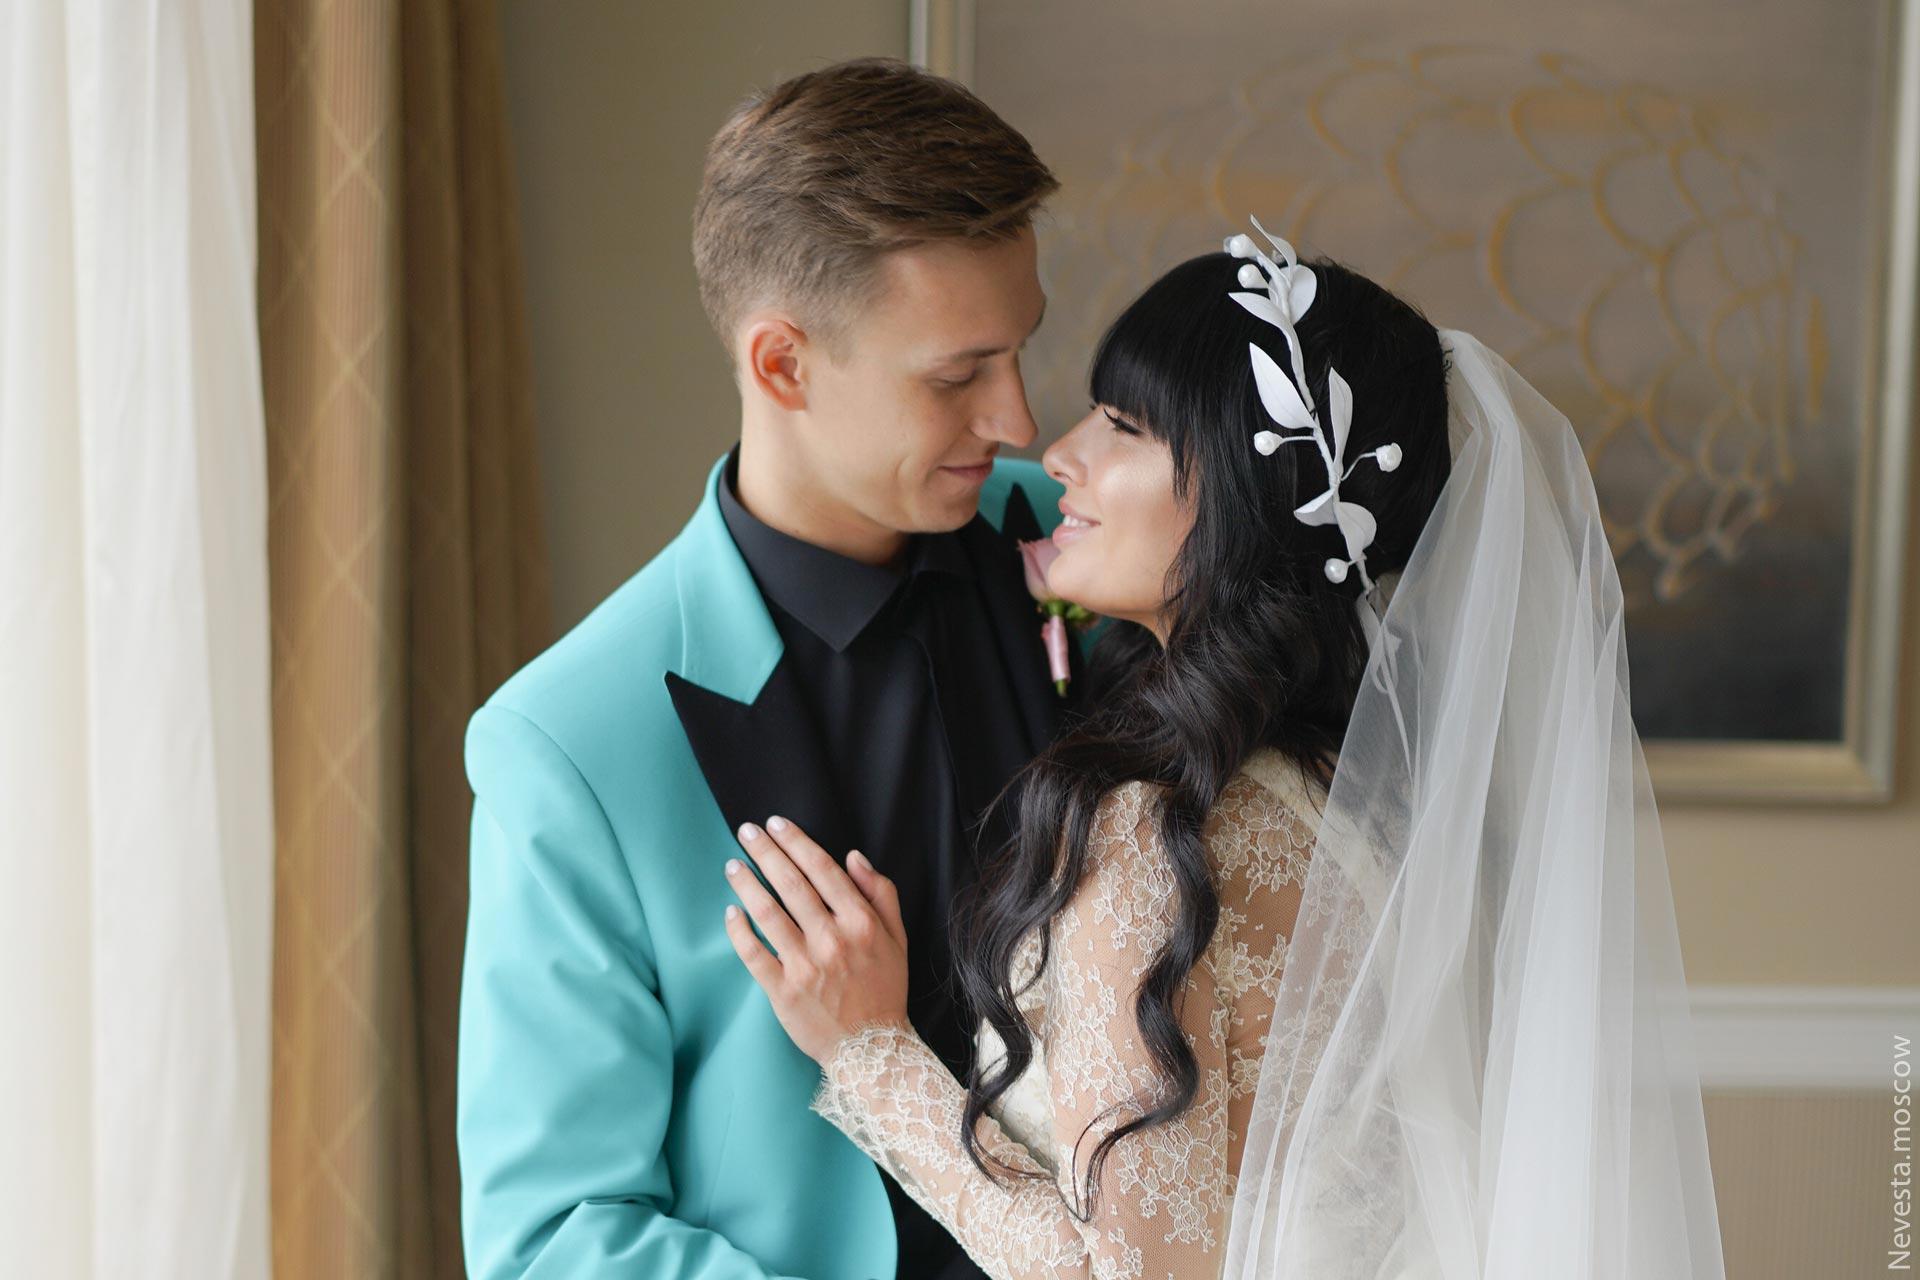 Свадьба Нелли Ермолаевой и Кирилла Андреева фото 23